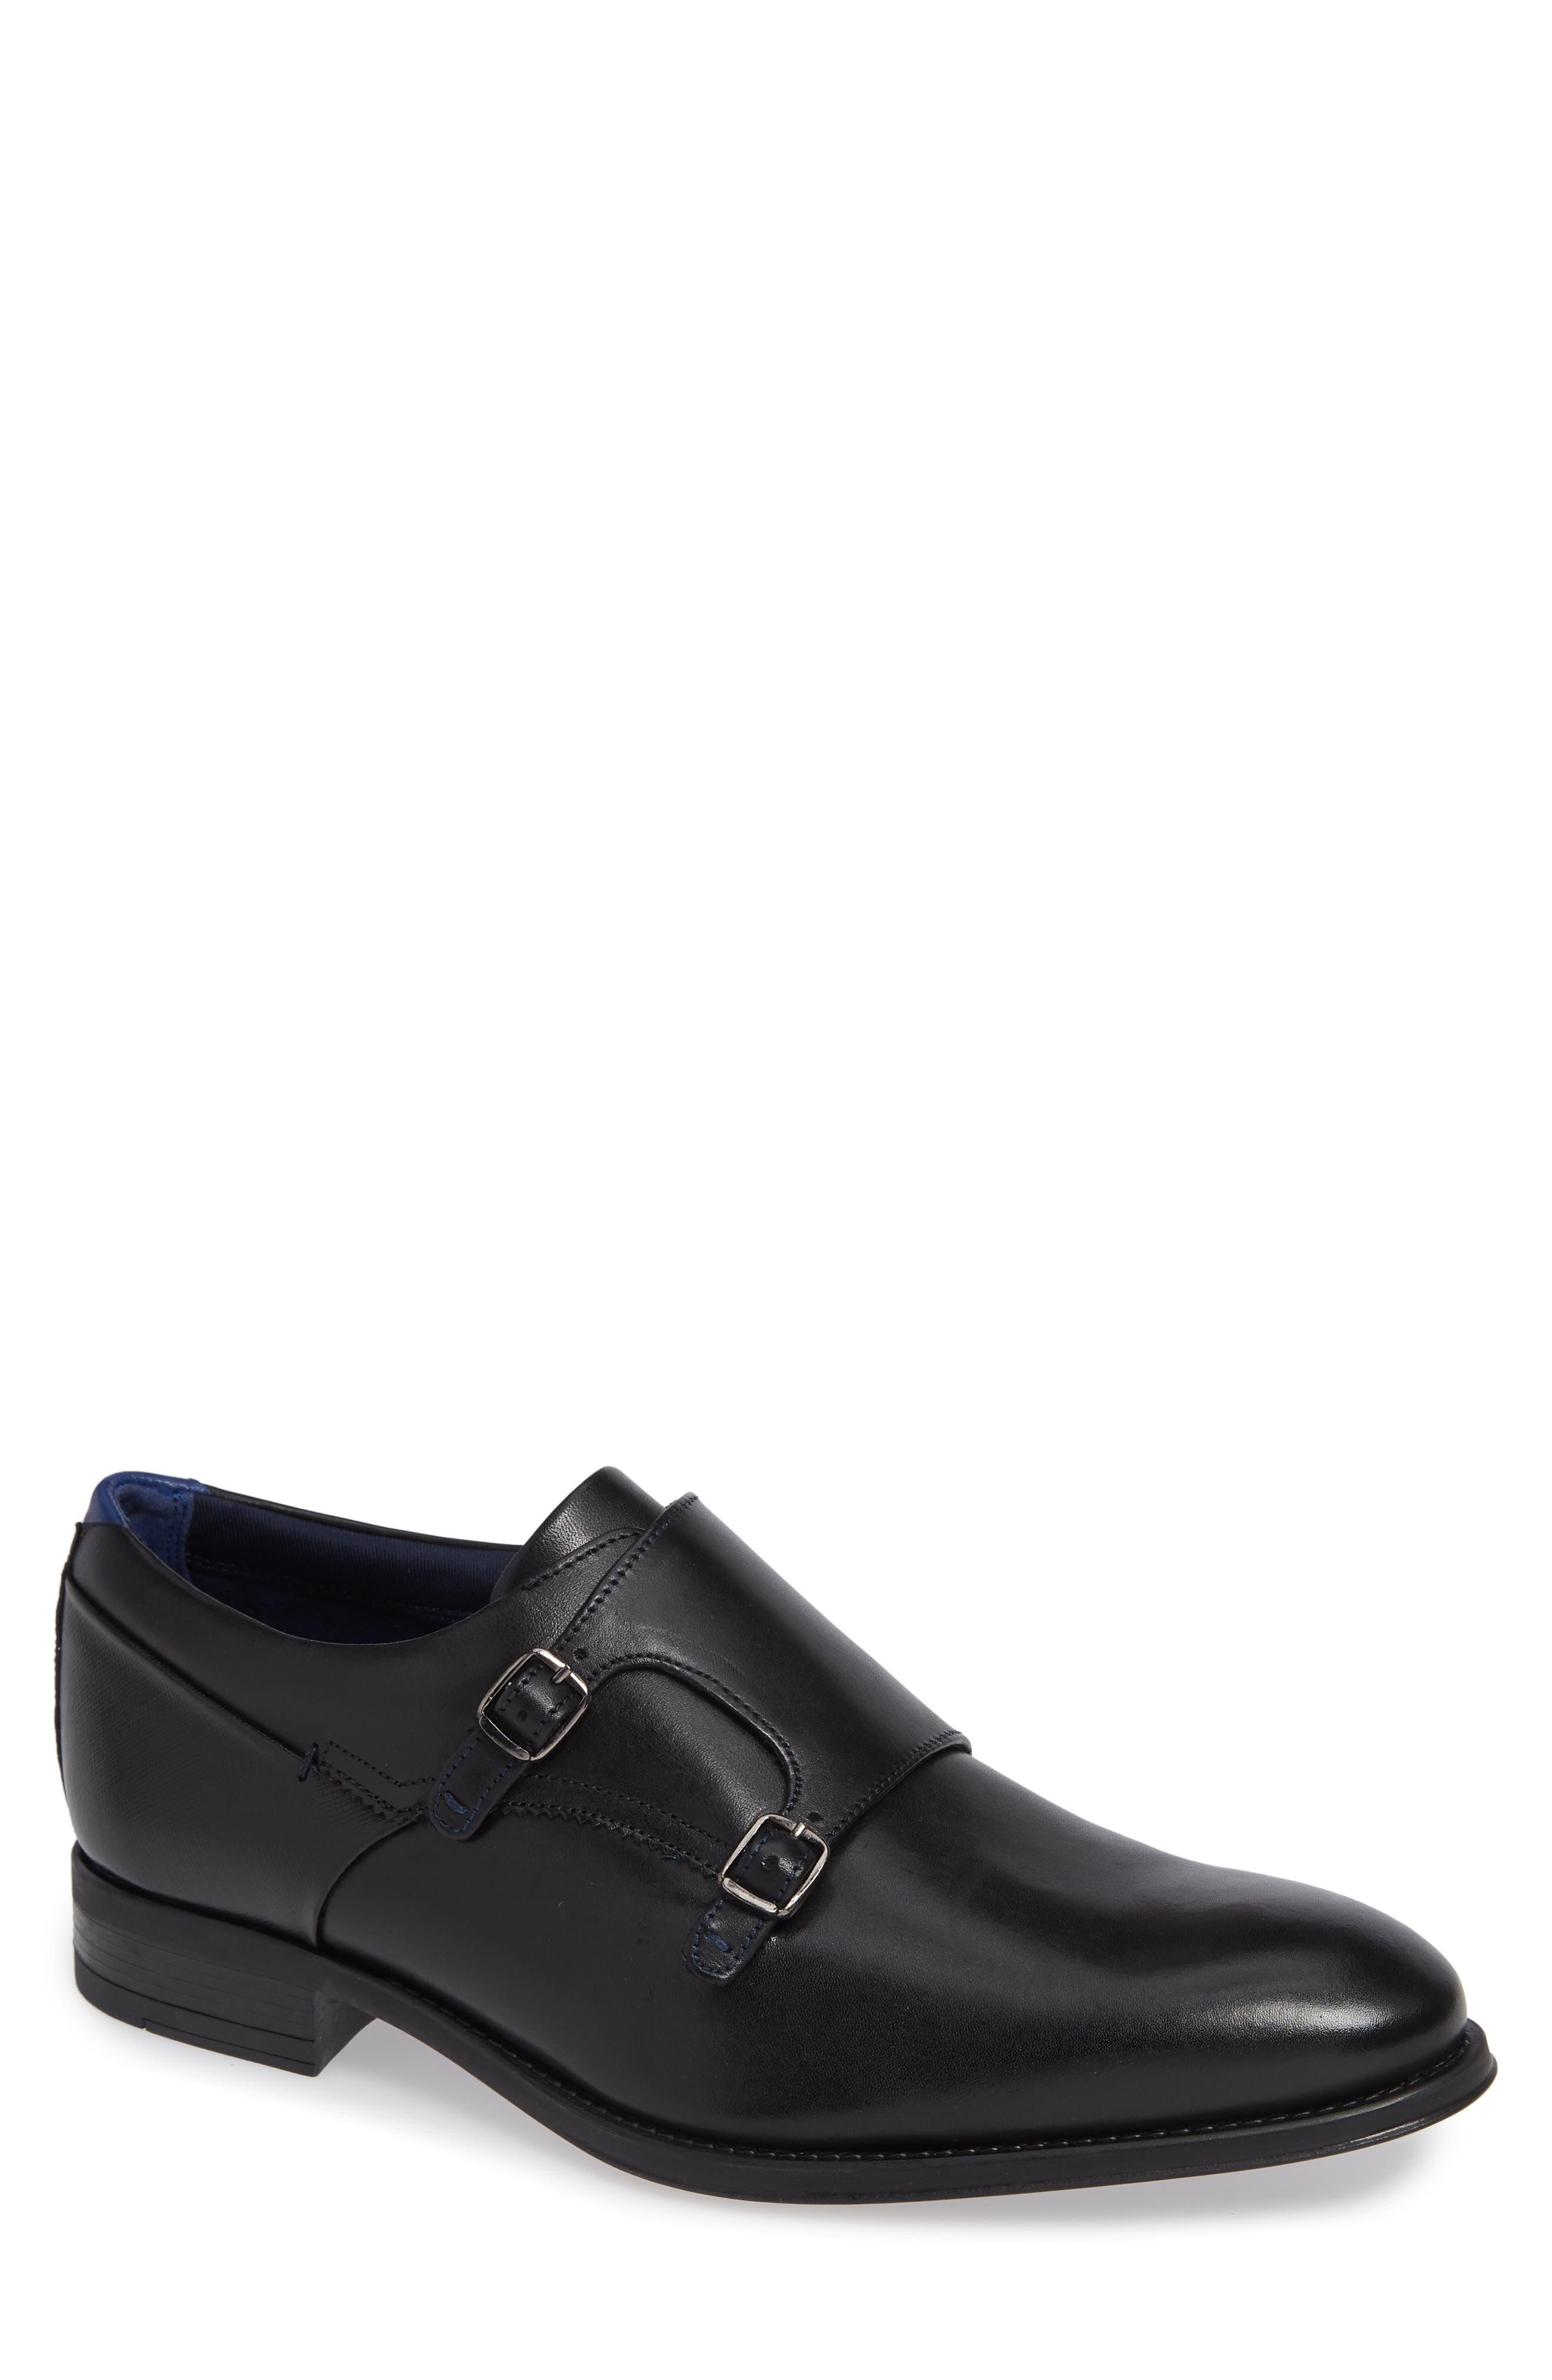 TED BAKER LONDON Cathon Double Buckle Monk Shoe, Main, color, BLACK LEATHER